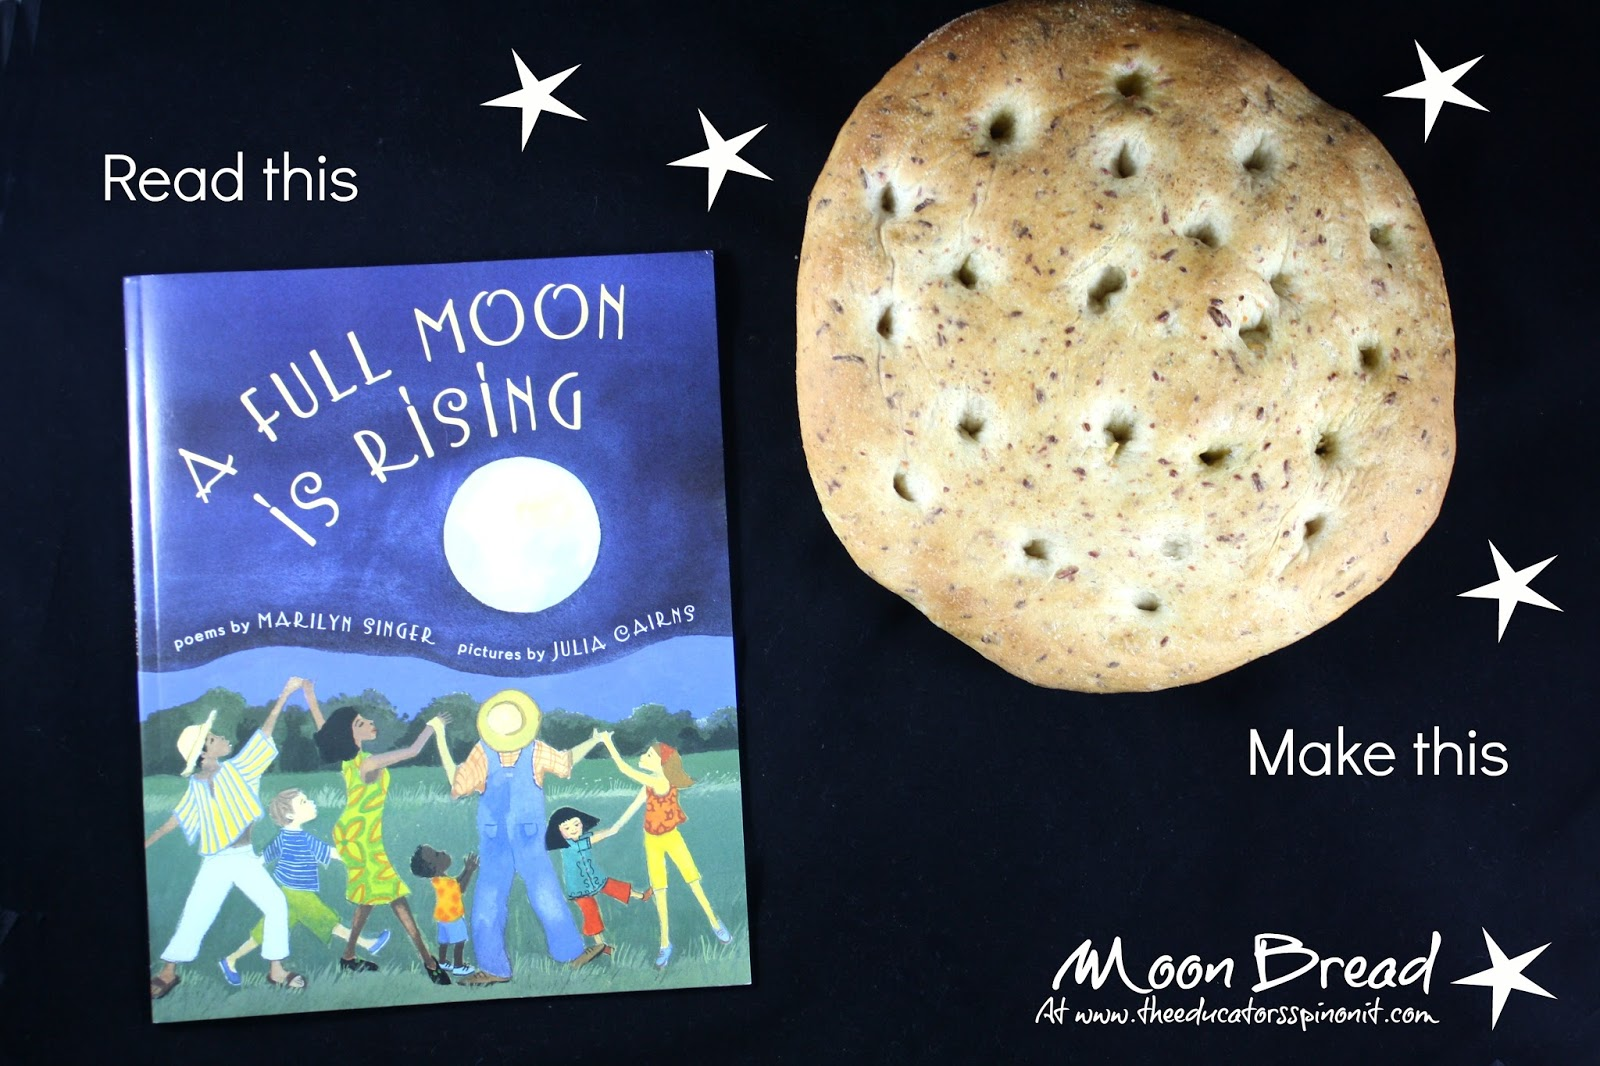 Moon Bread